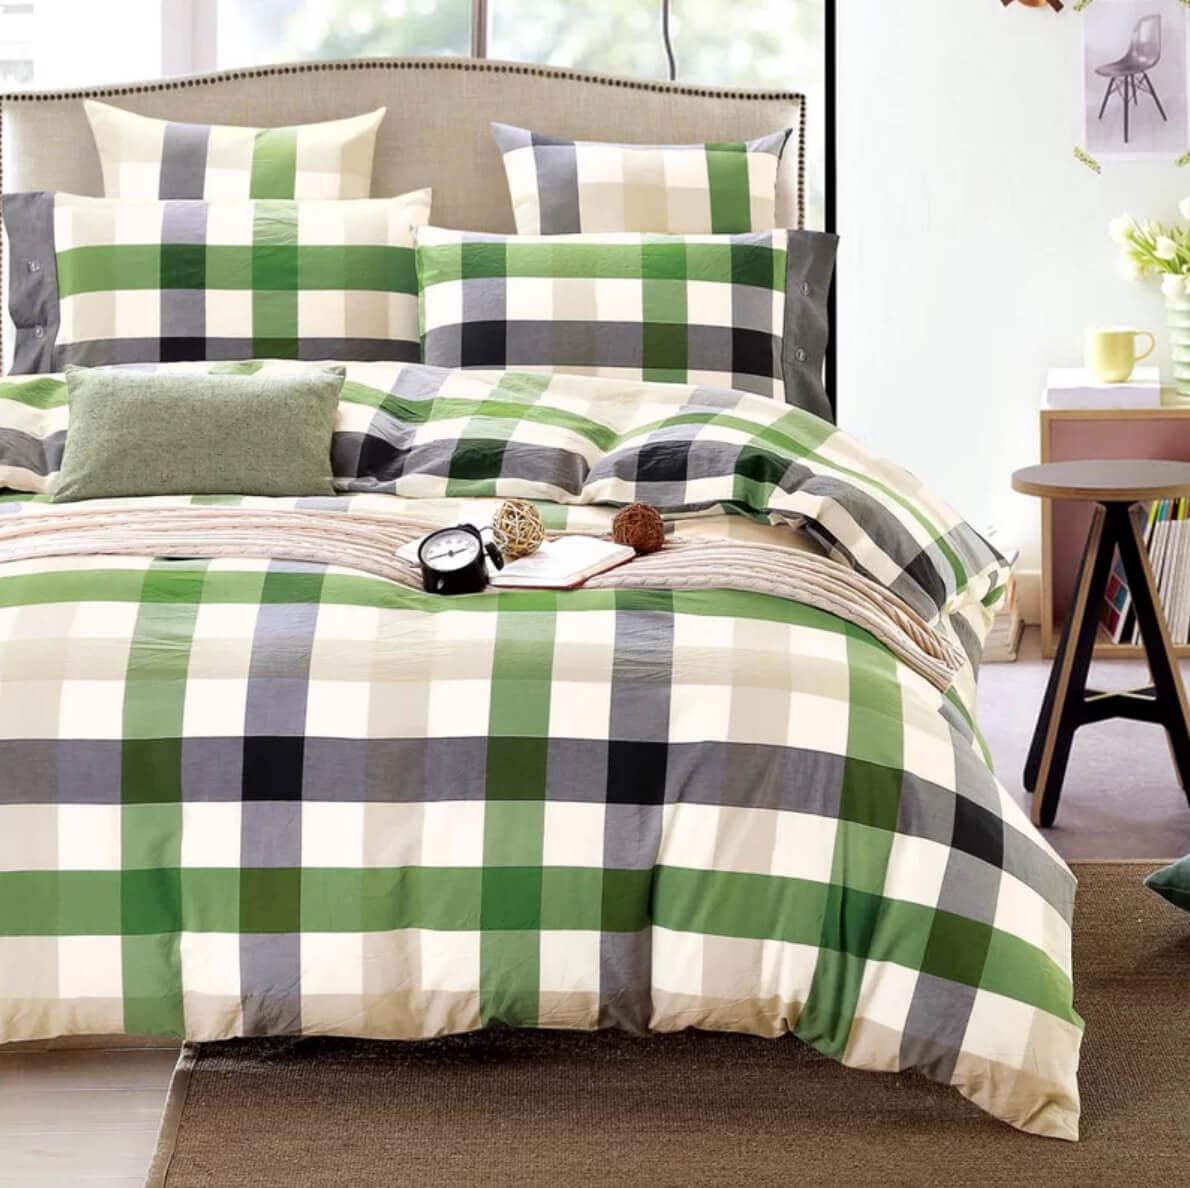 Plaid Bedroom Decor